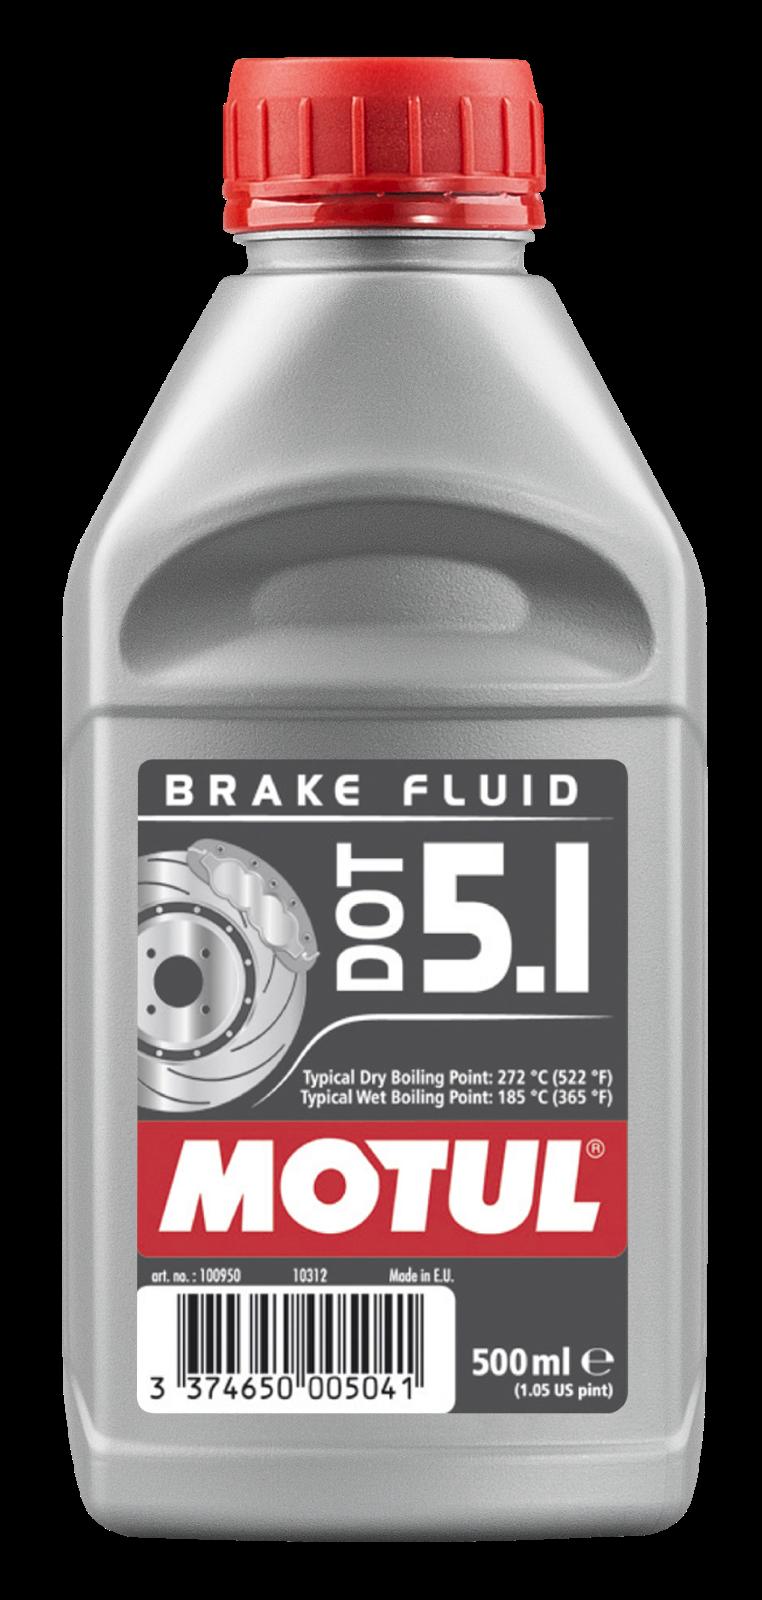 MOTUL AG MOTUL DOT5.1 Brake Fluid 0,5L